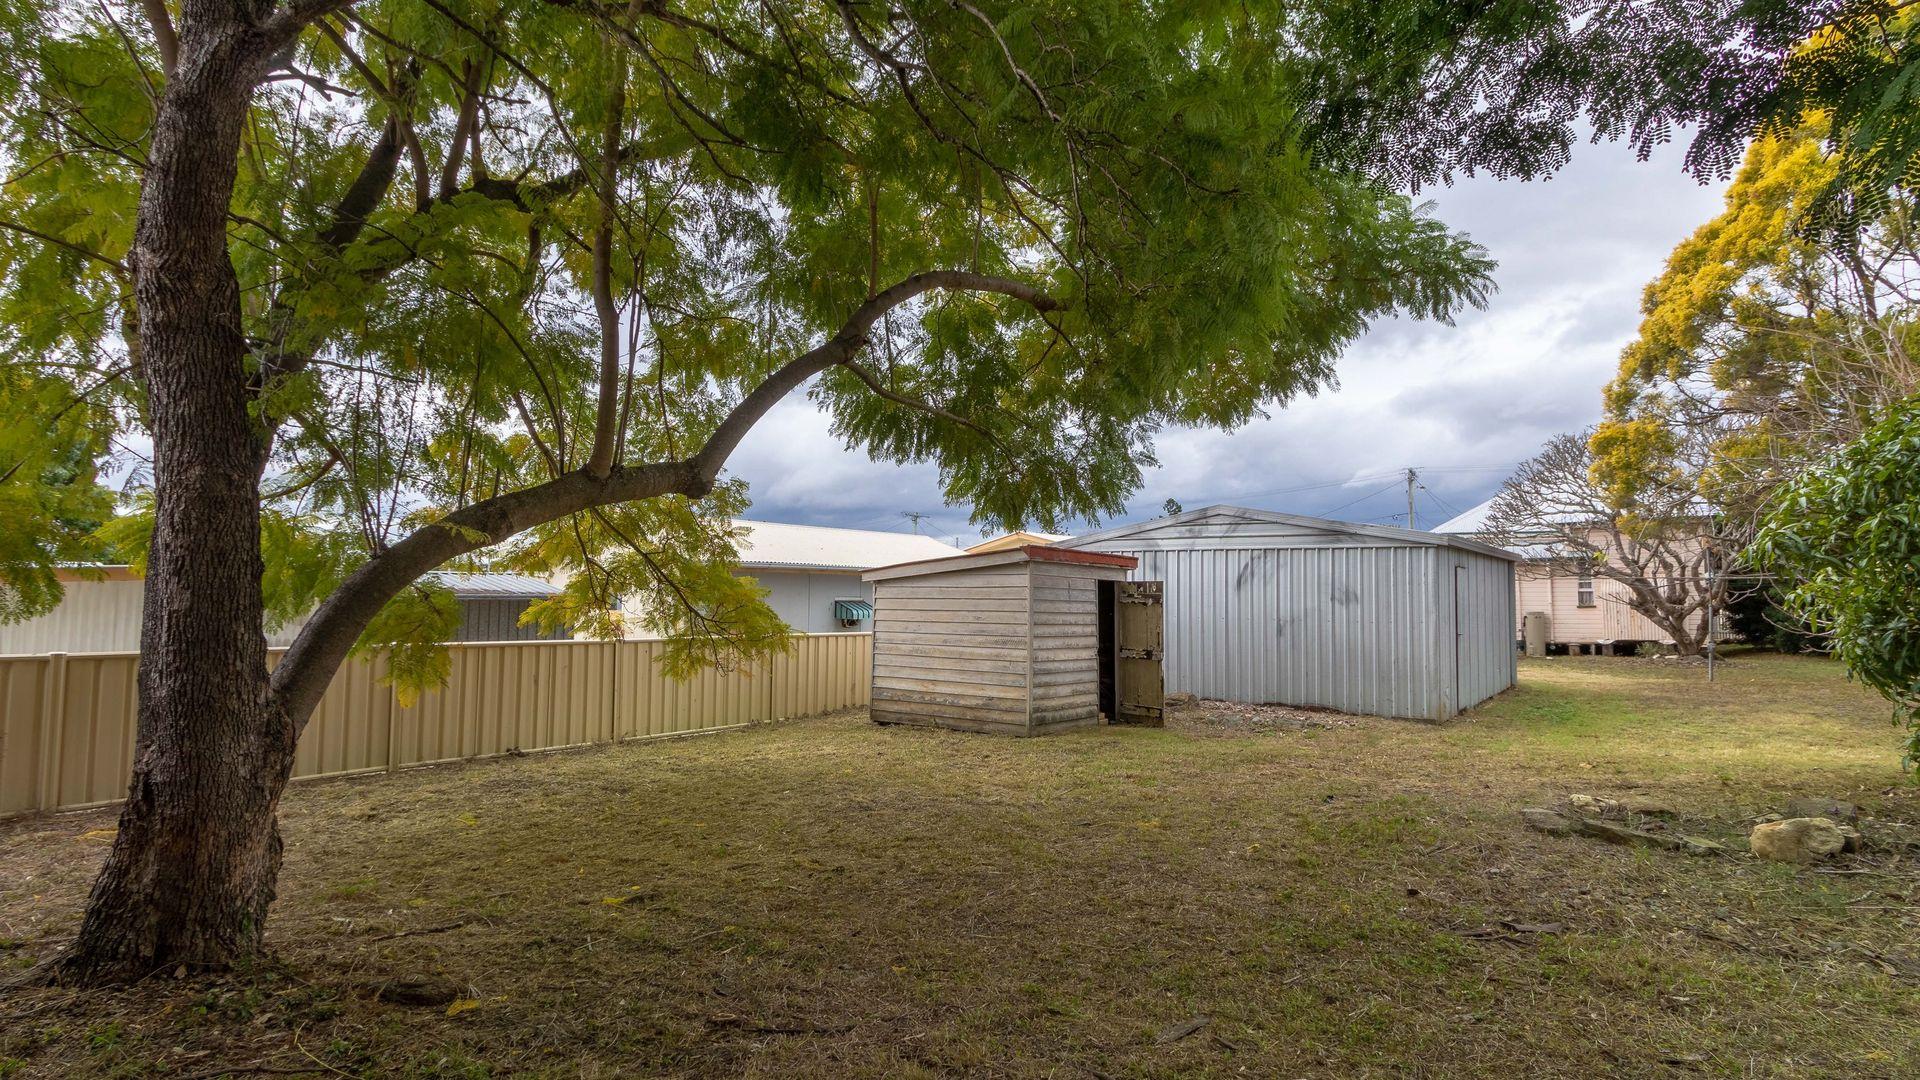 25 THOMPSON STREET, Silkstone QLD 4304, Image 2